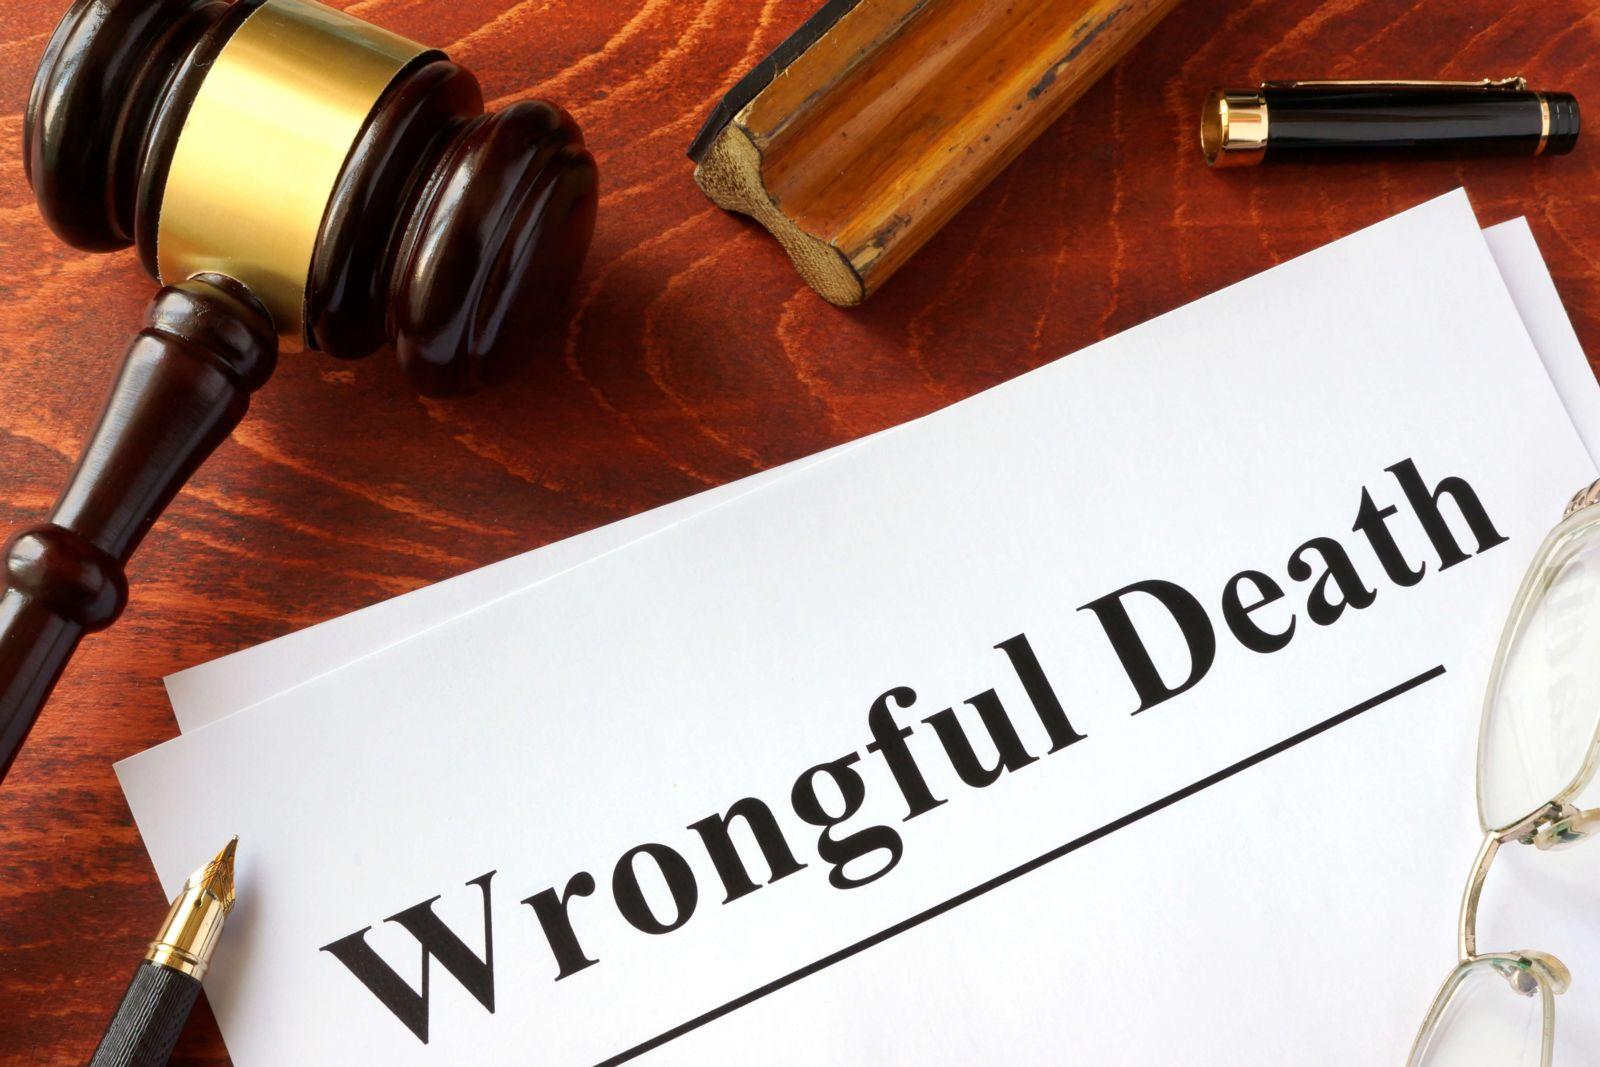 Missouri Wrongful Death Law